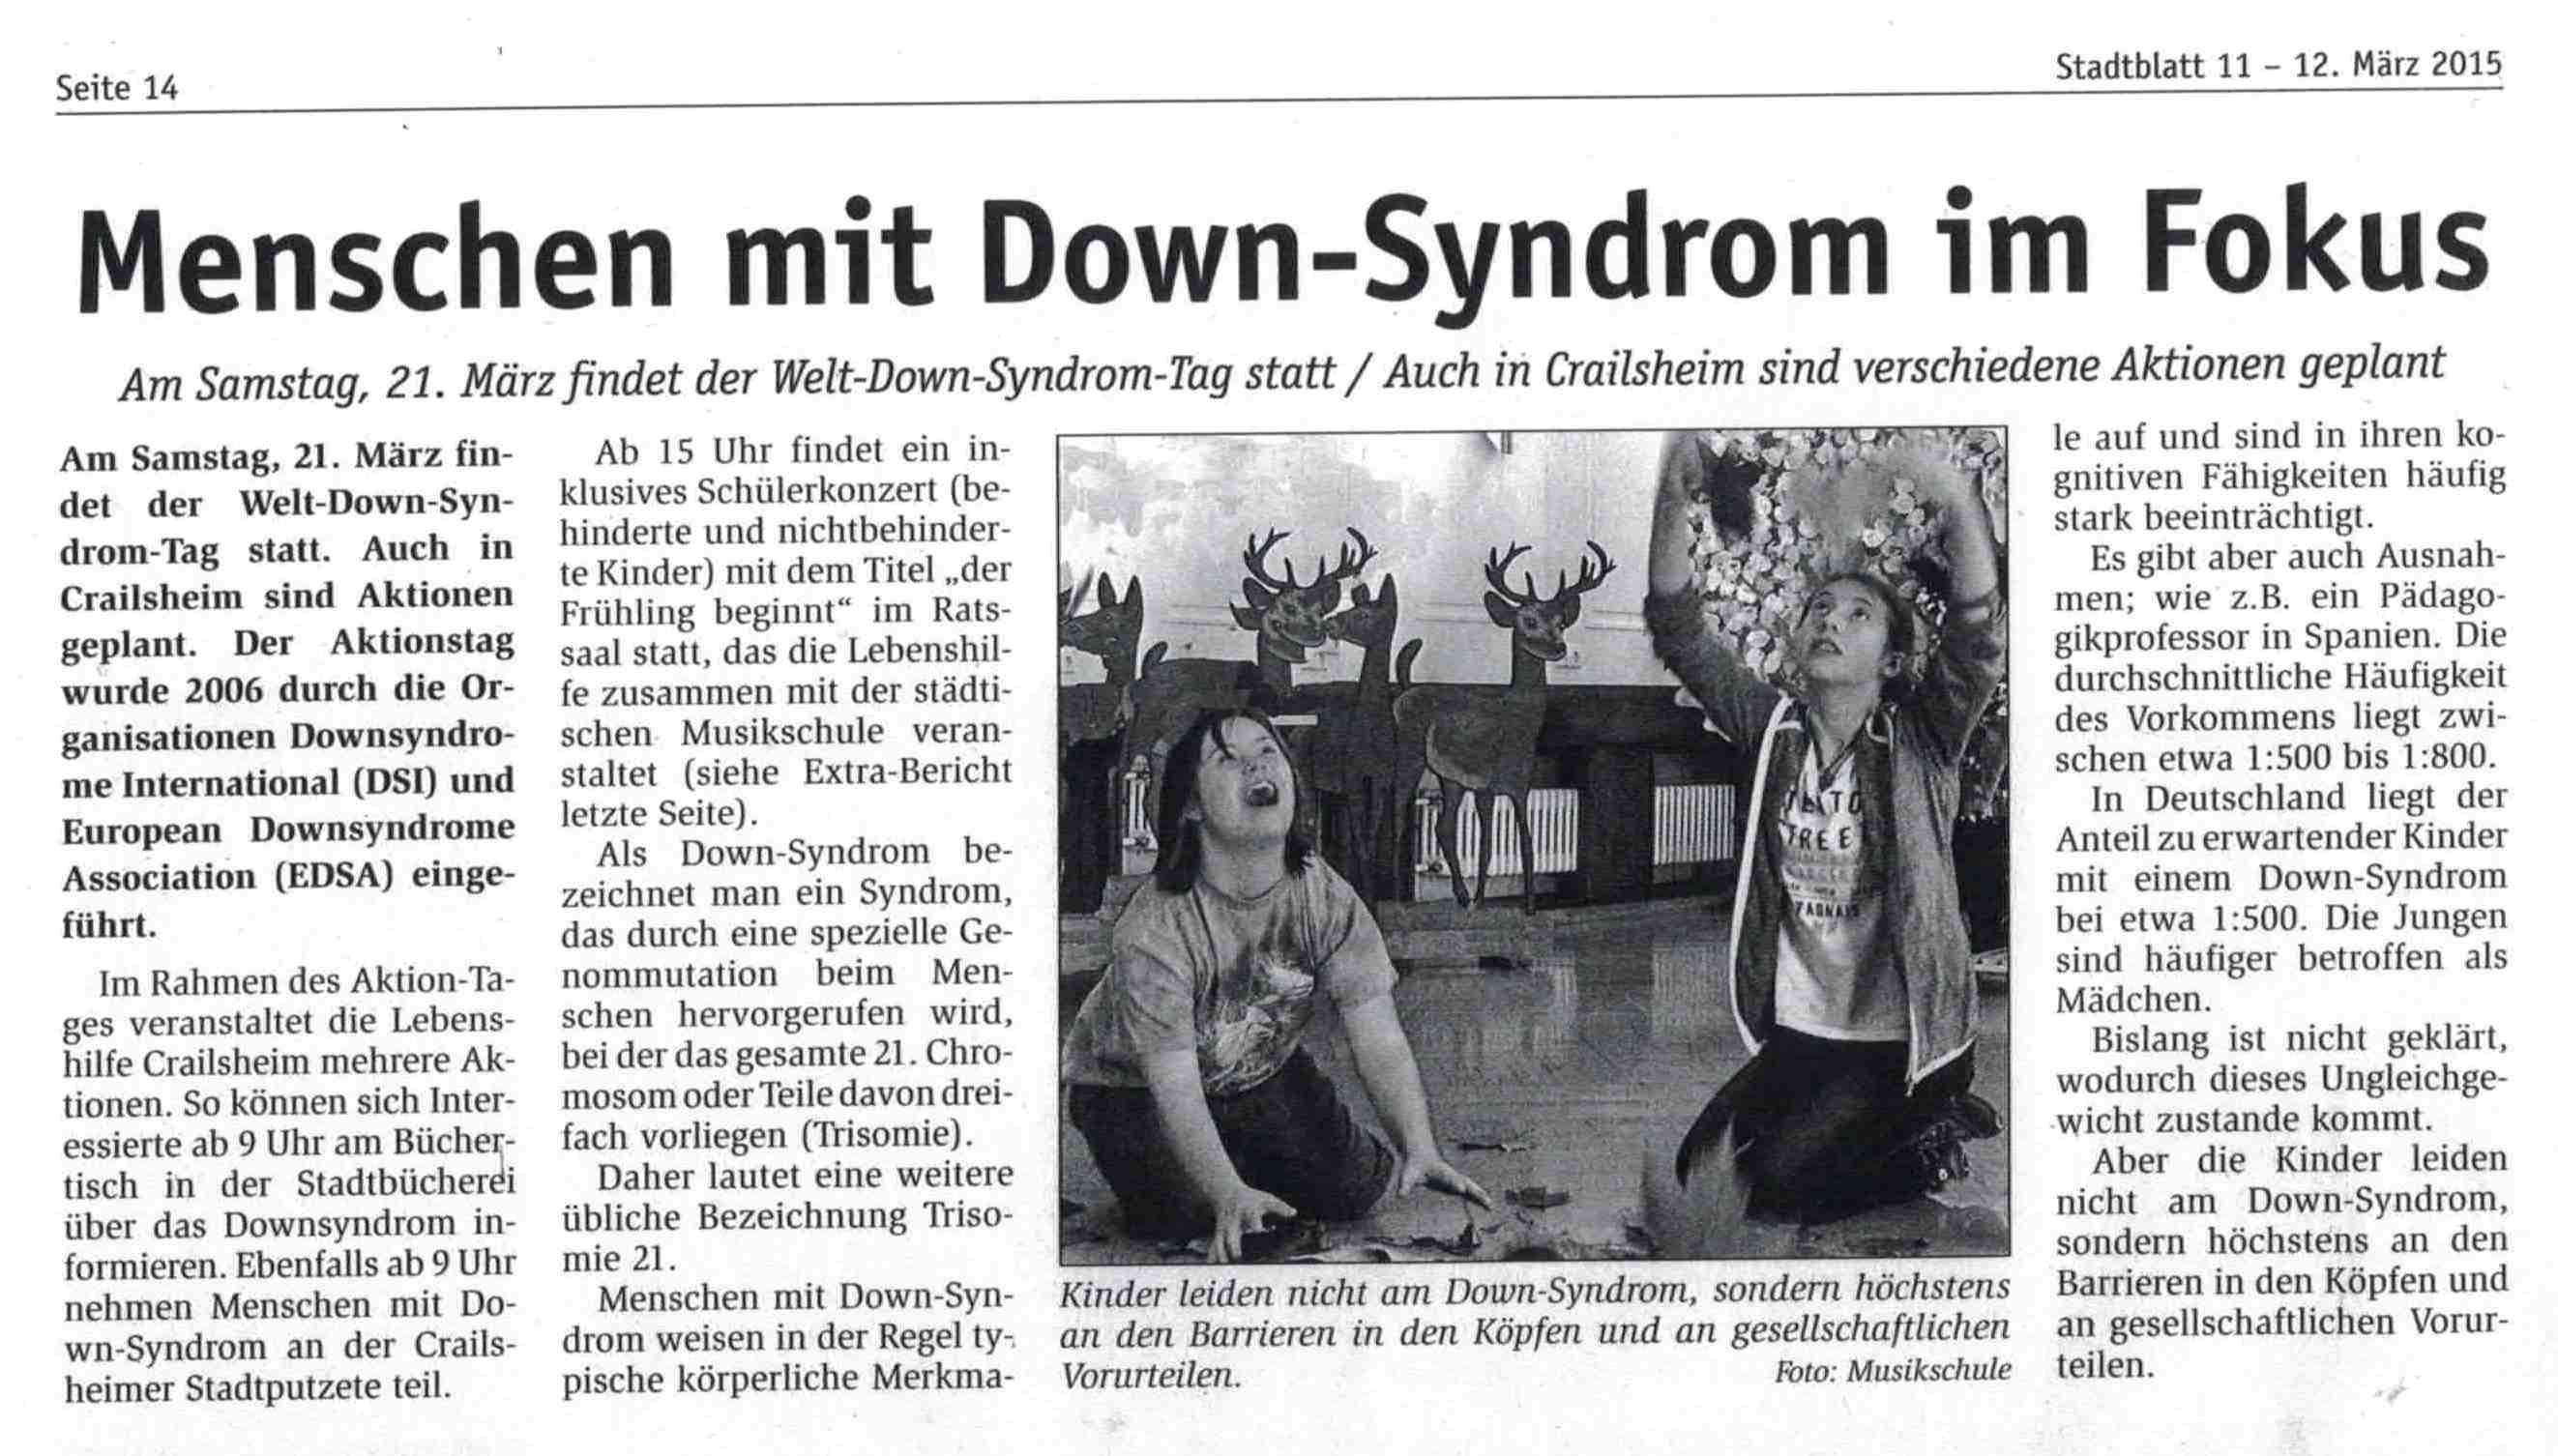 Stadtblatt 2015-3.1.jpg - 249.59 KB